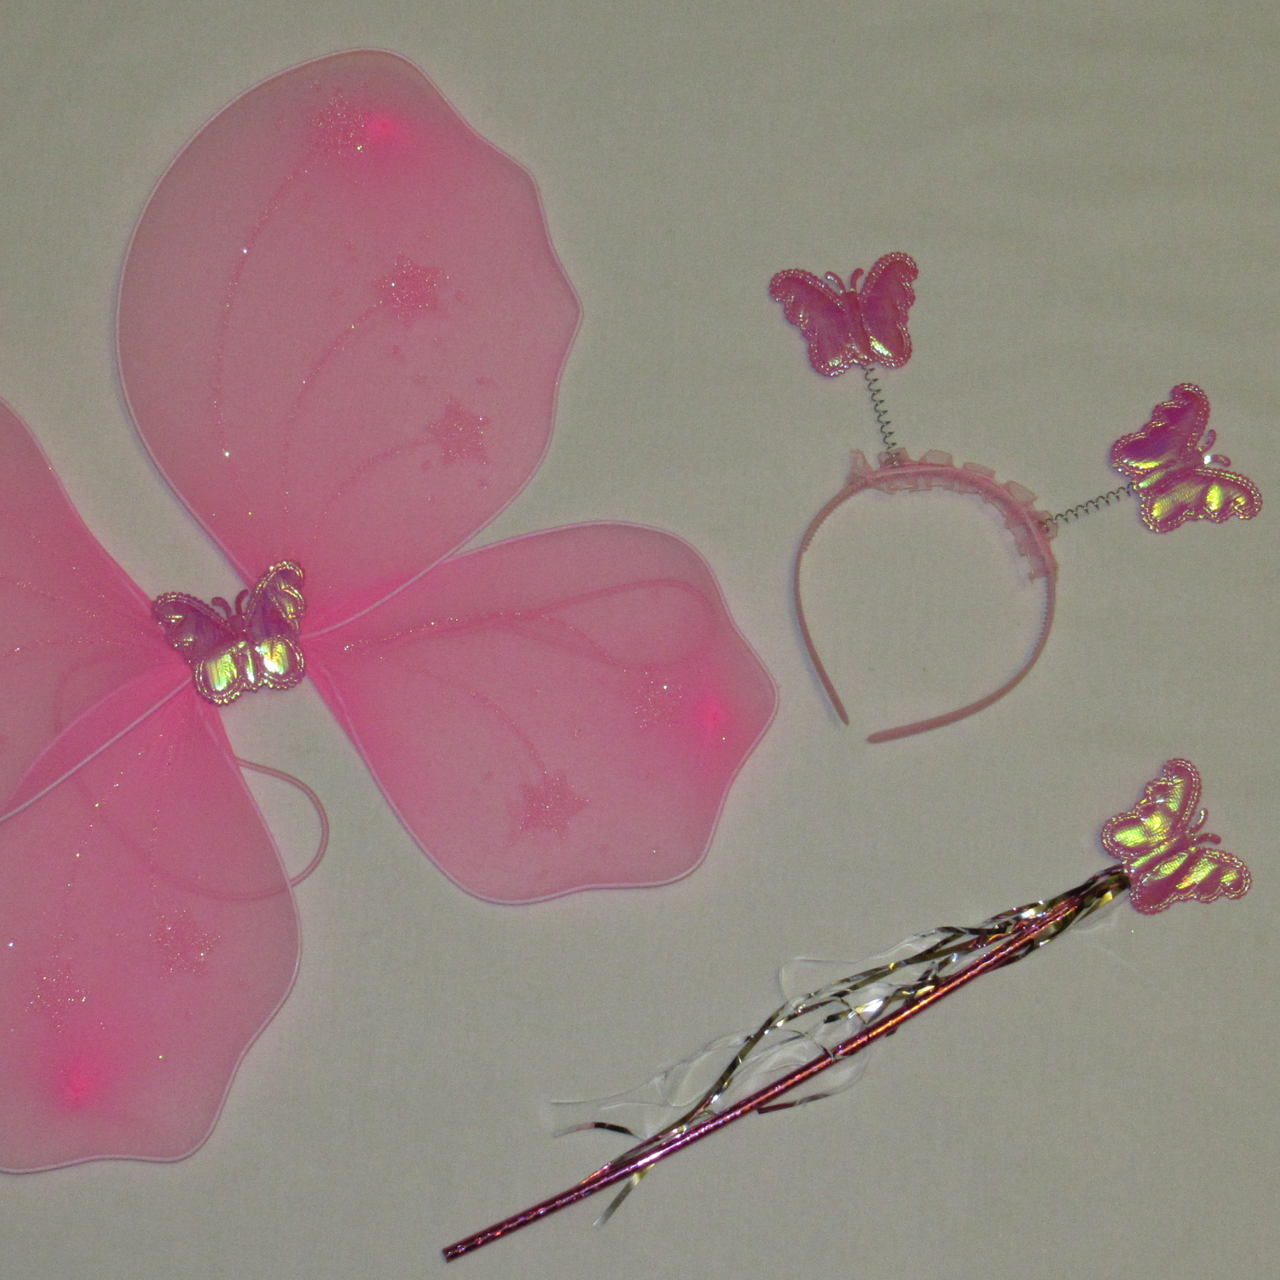 Дитячий набір феї рожевого кольору крила паличка обруч. Карнавальний набір Метелик/Фея. Набір 3 в 1 феї 24937